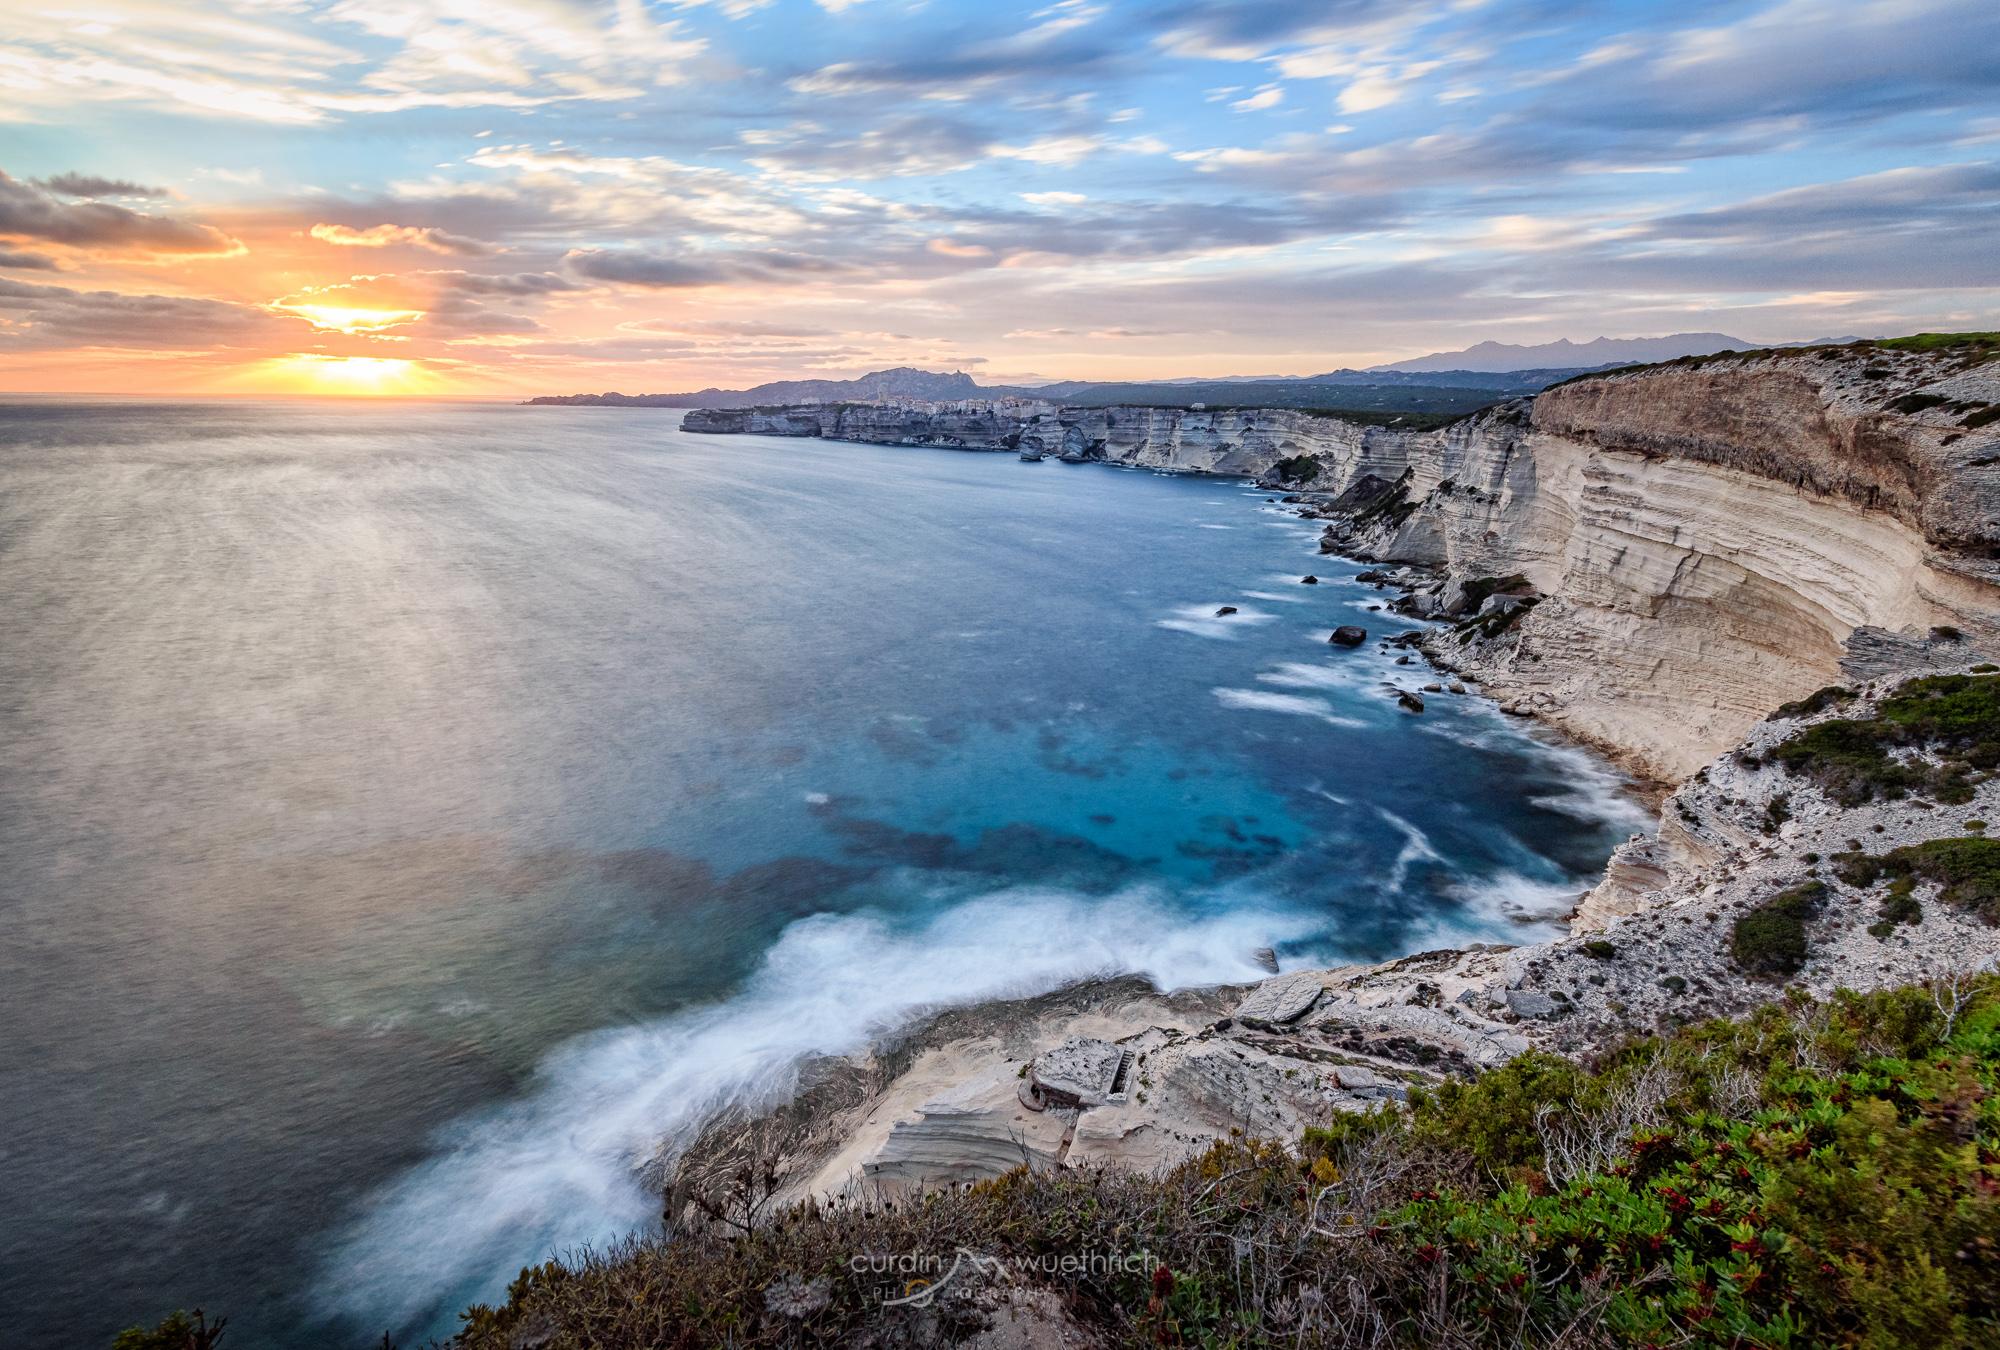 Bonifaccio cliffs